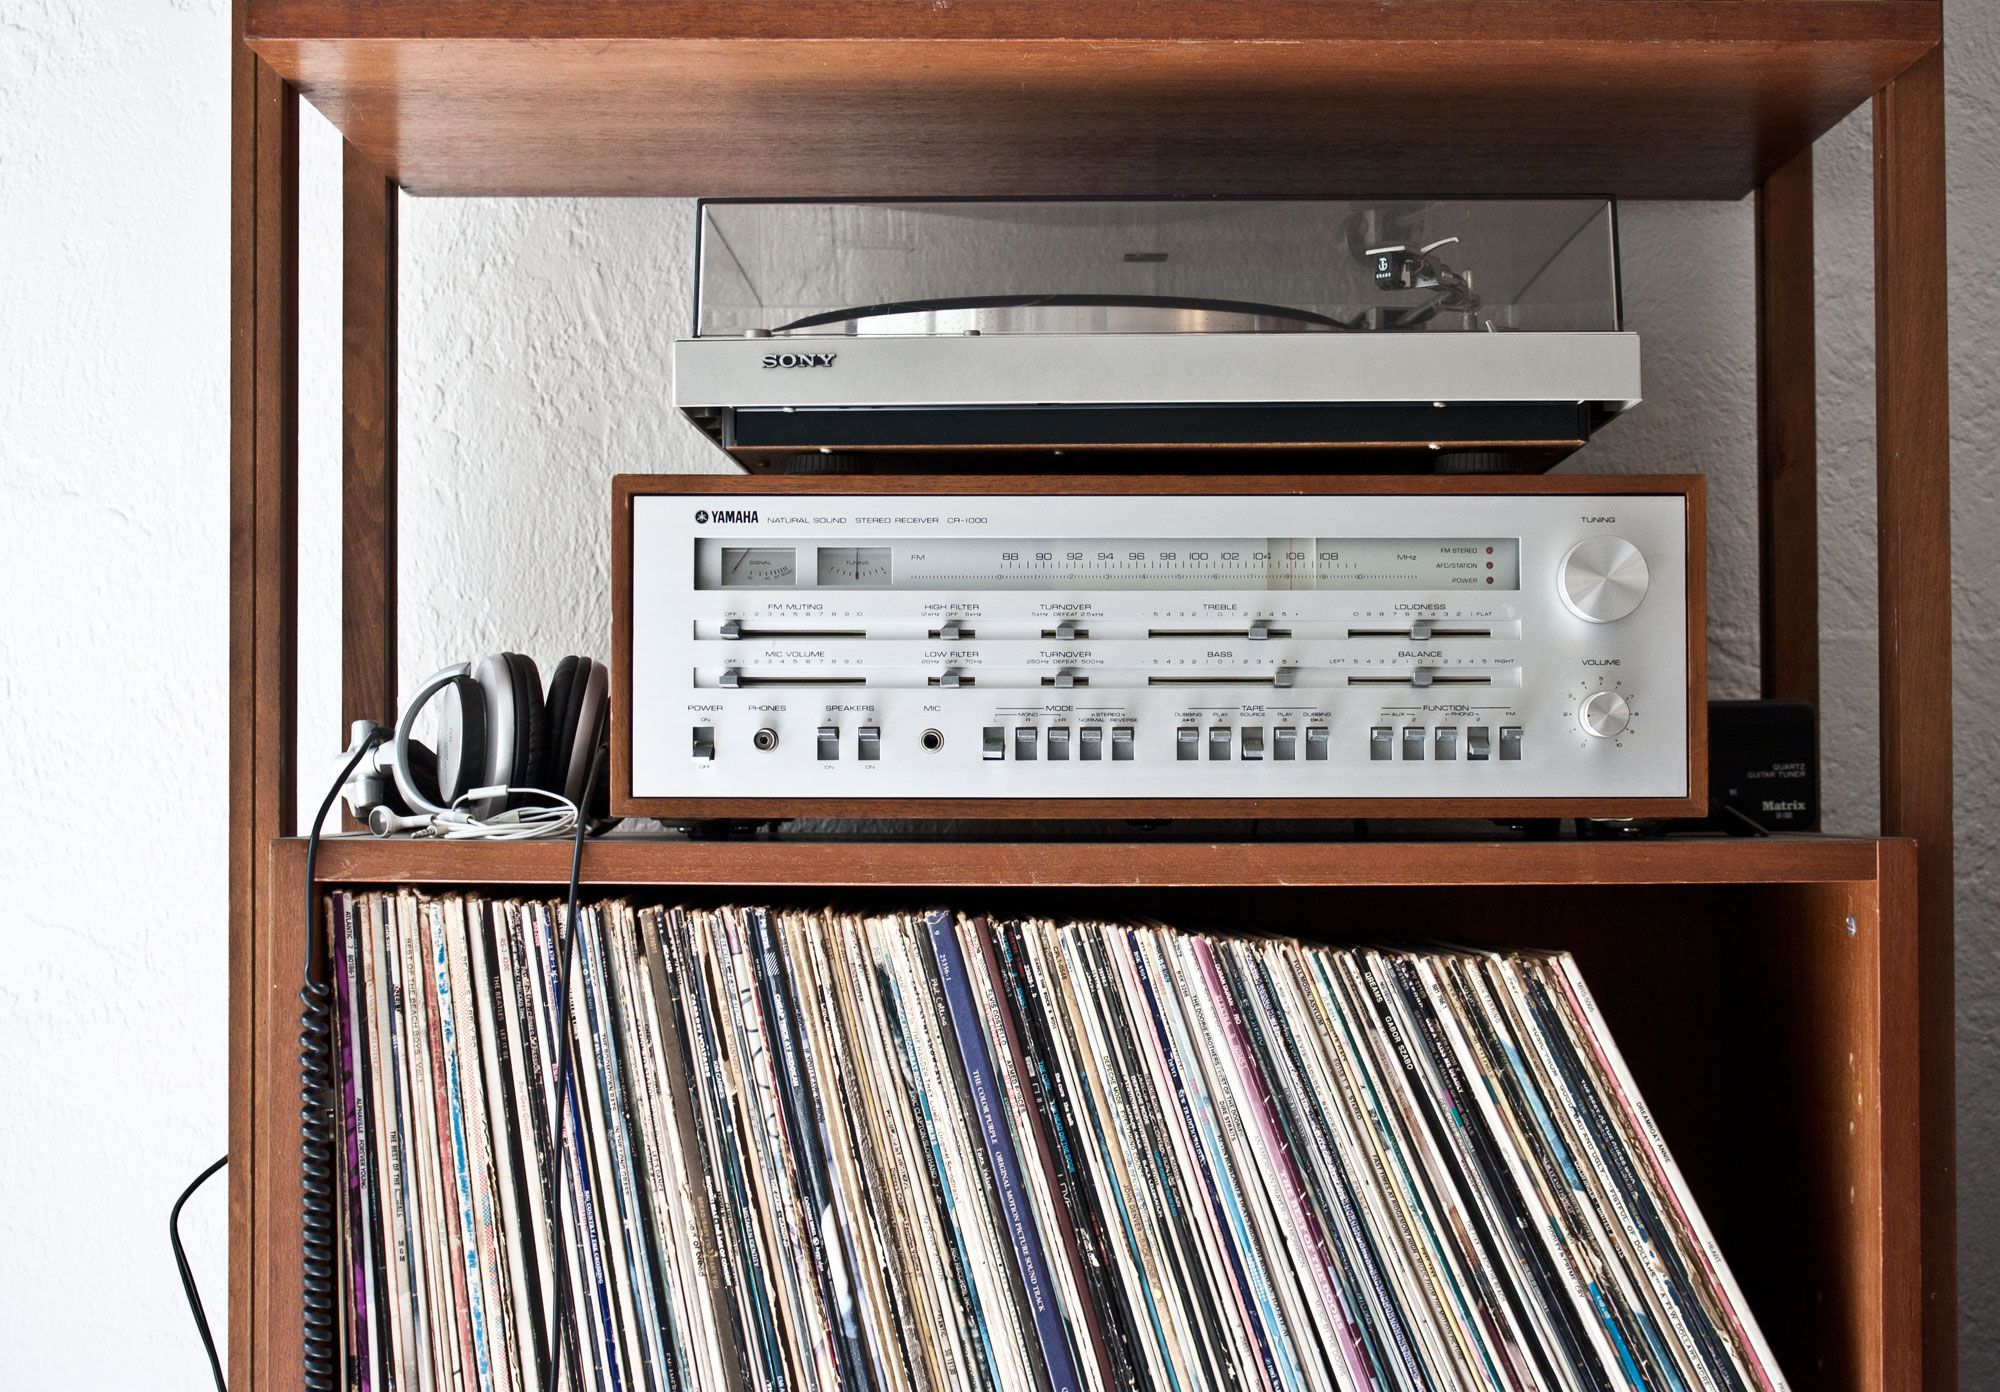 My Vintage Yamaha Stereo Sony Turntable Vintage Stereo Yamaha Vinyl 1970s Audio Room Vintage Stereo